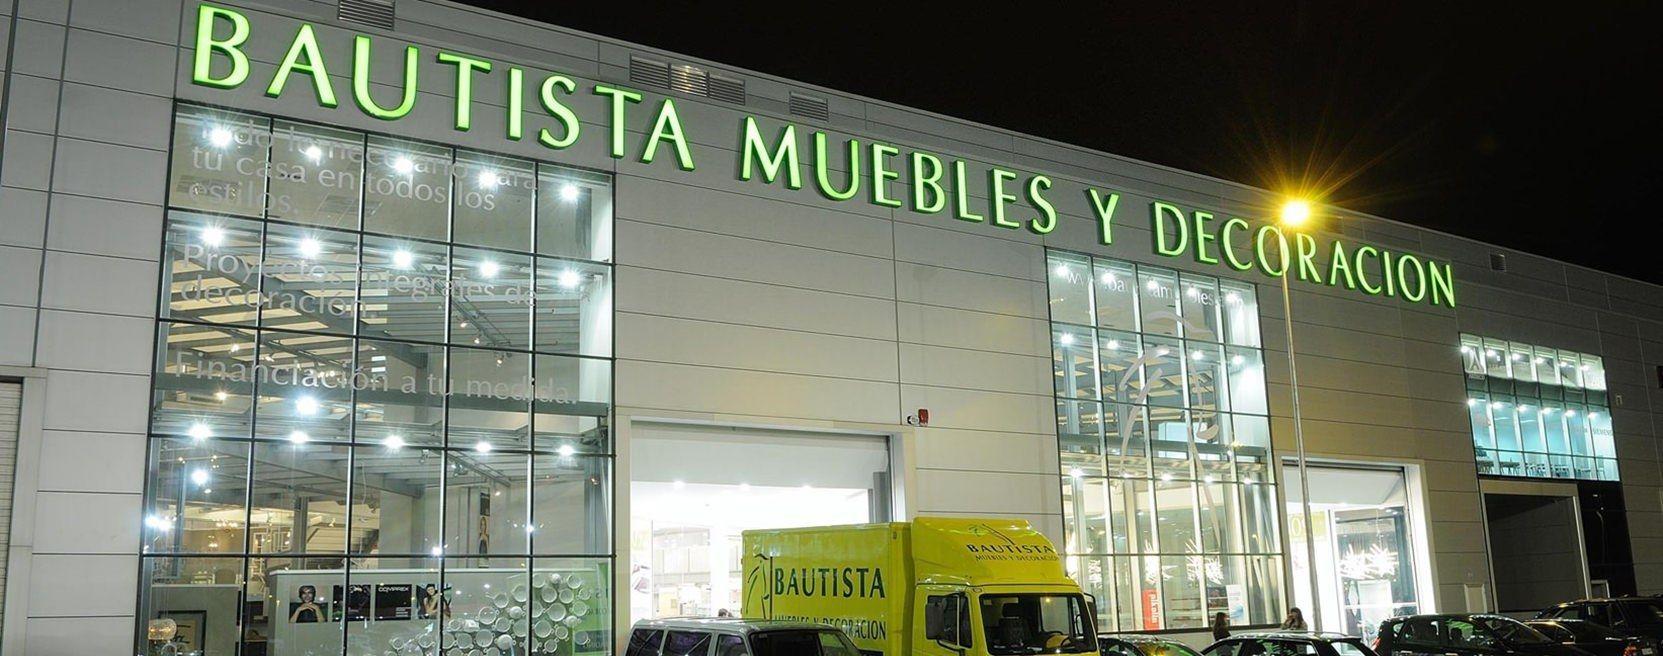 Muebles Bautista - Contacto Bautista Muebles Y Decoraci N[mjhdah]http://www.bautistamuebles.com/wp-content/uploads/2016/09/llodio.jpg